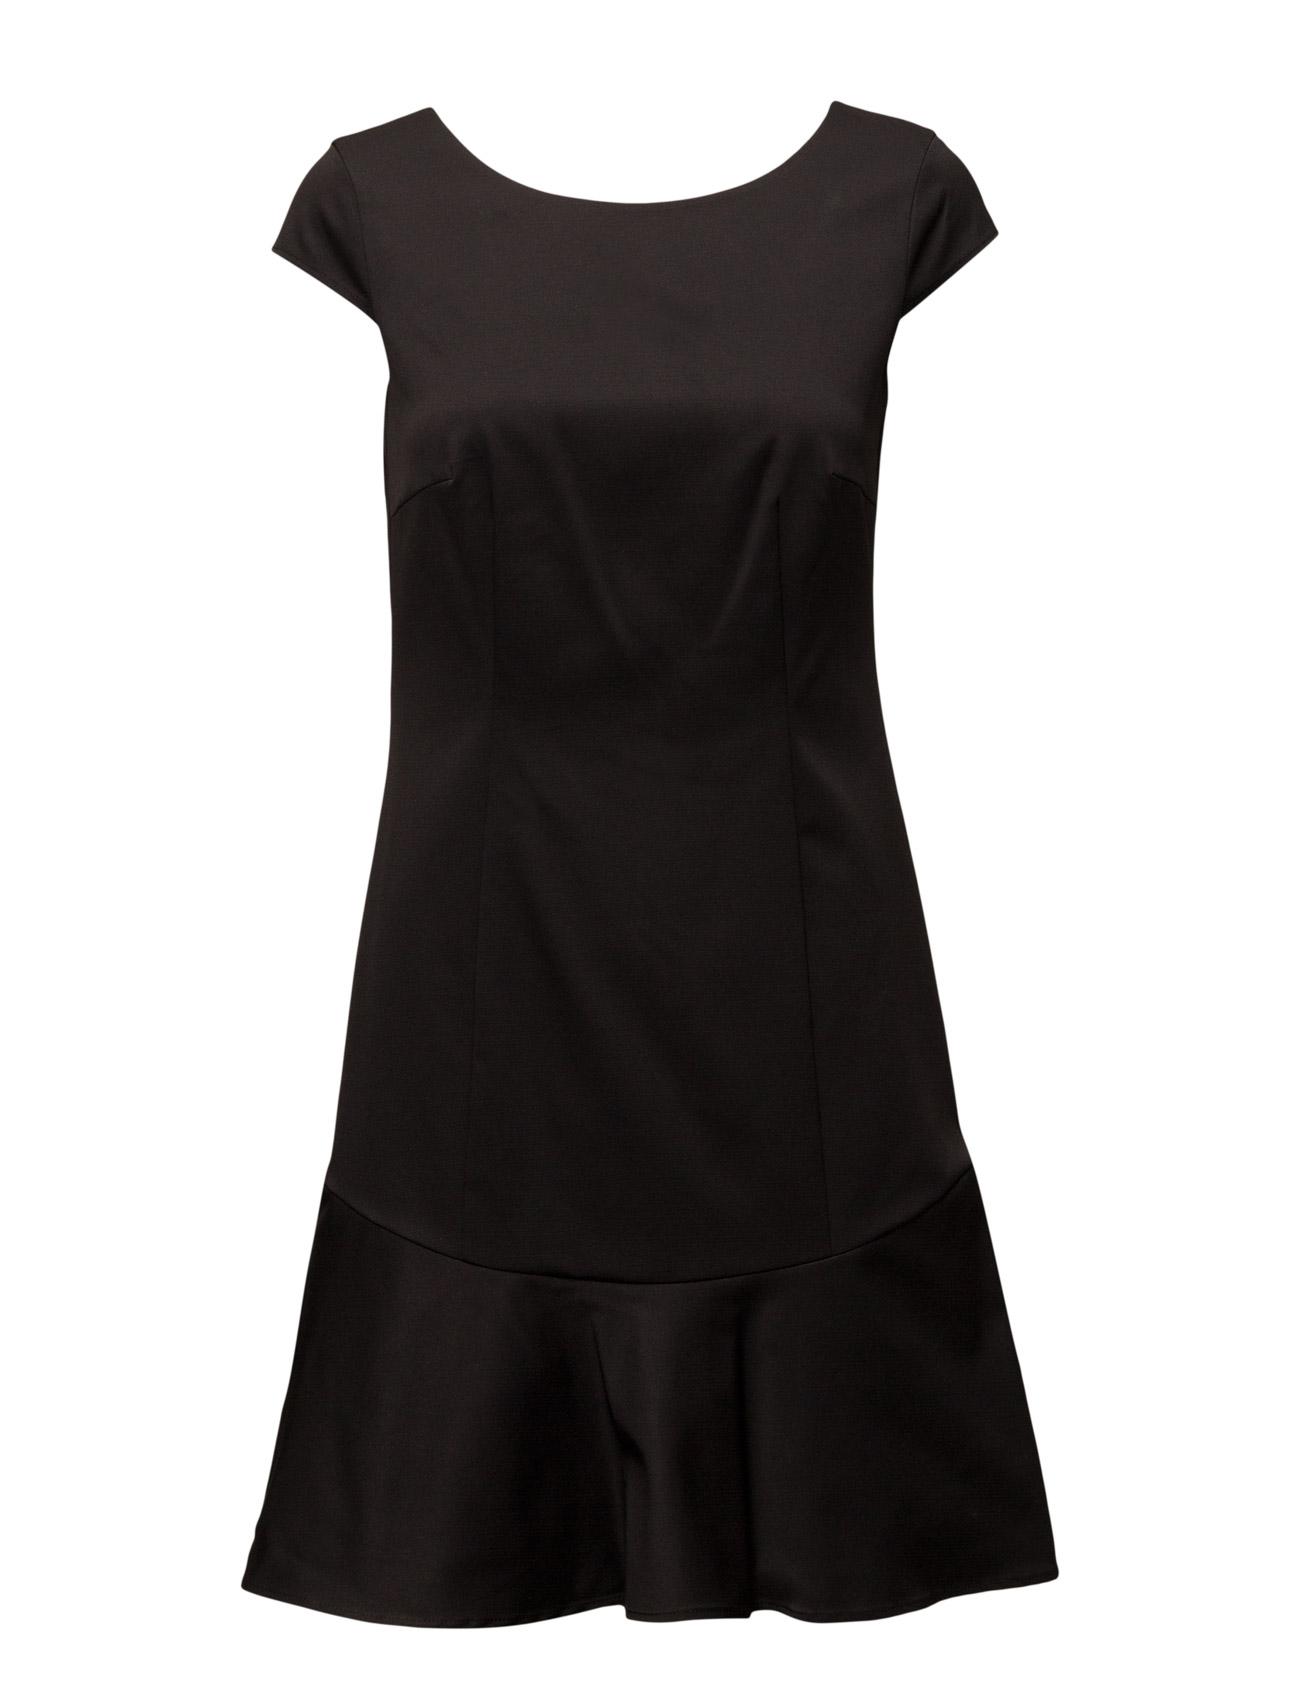 Dresses Woven Esprit Collection Korte kjoler til Damer i Sort